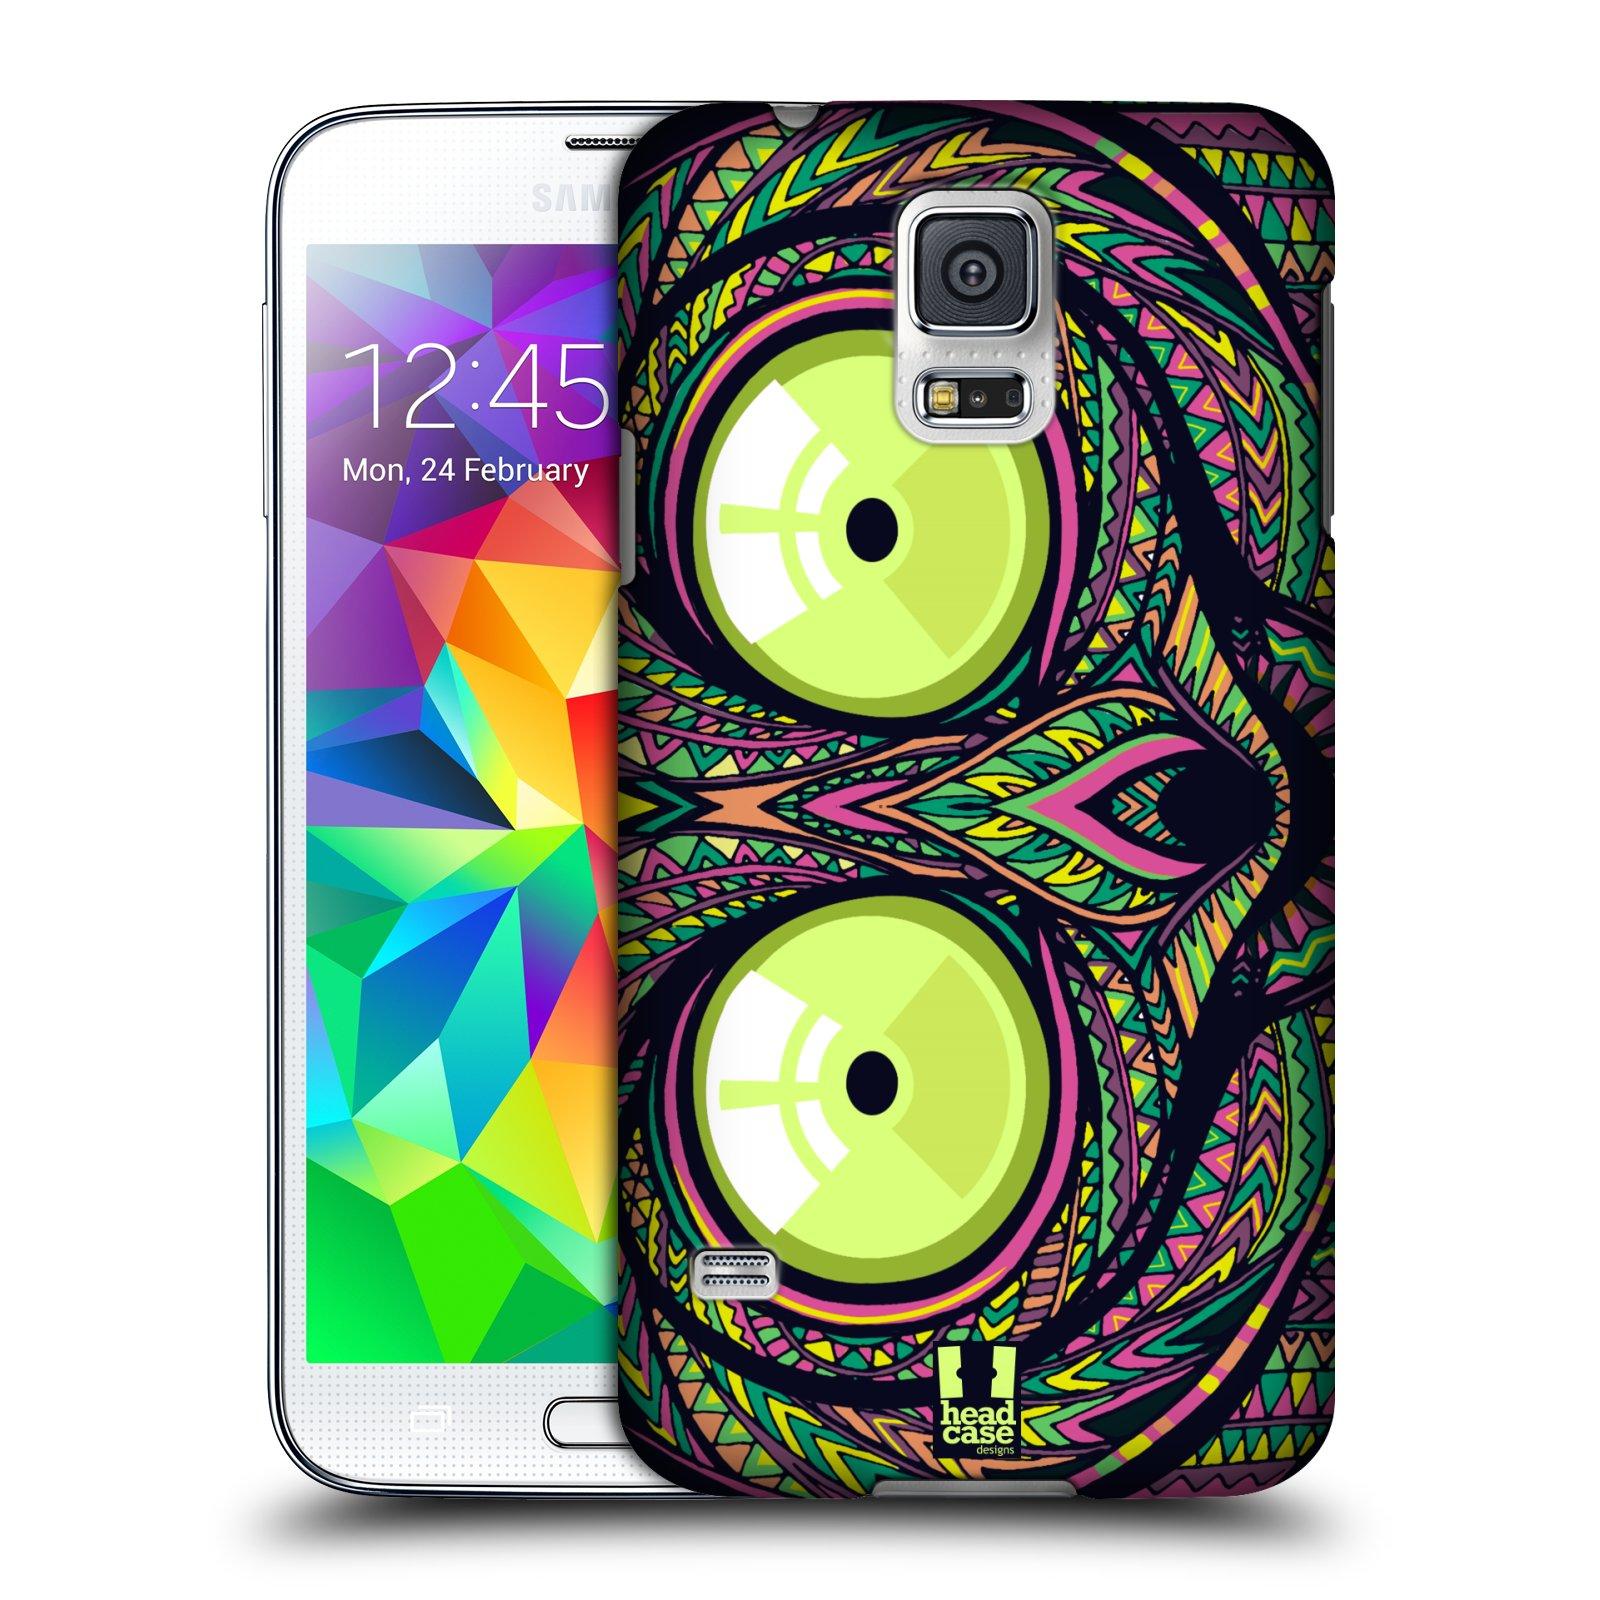 Plastové pouzdro na mobil Samsung Galaxy S5 Neo HEAD CASE AZTEC NÁRTOUN